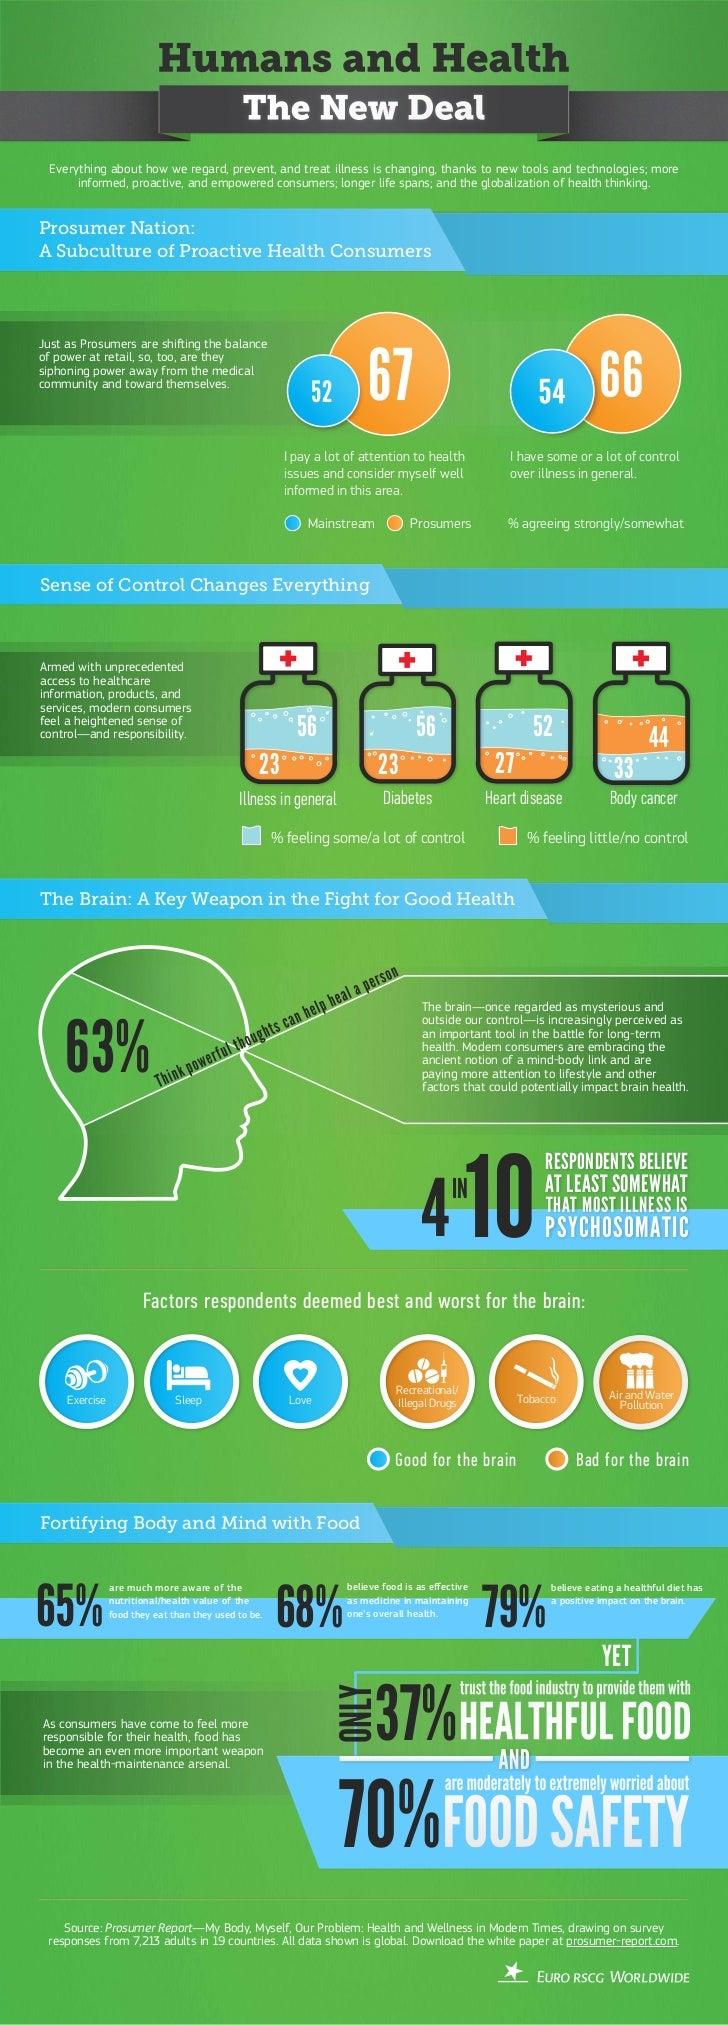 Euro RSCG Prosumer Report Health and Wellness digital infographic